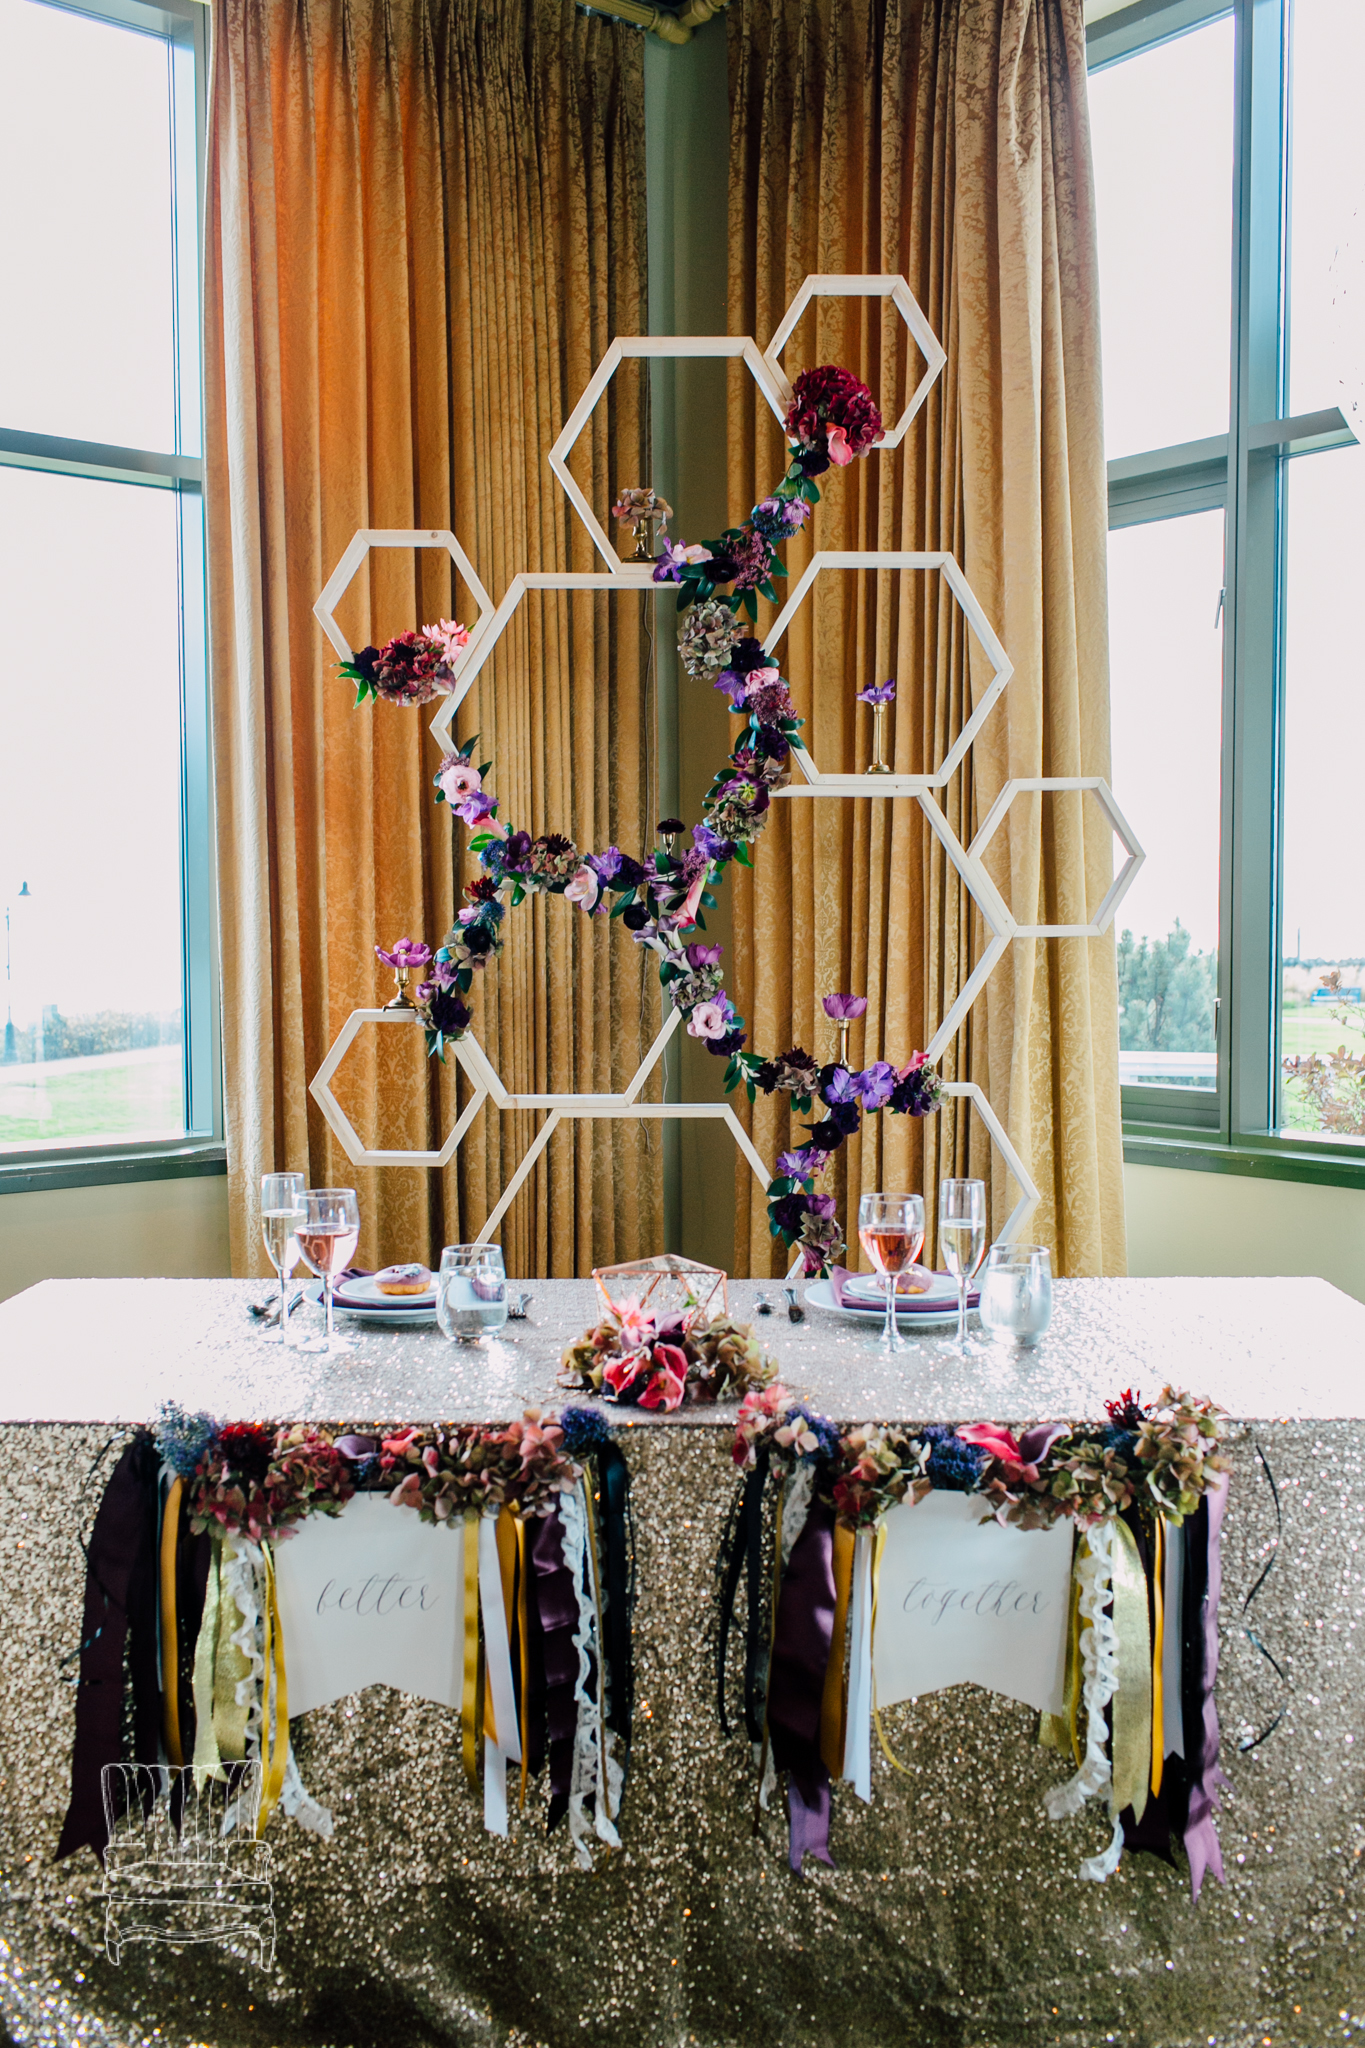 bellwether-bellingham-wedding-styled-katheryn-moran-photography-3.jpg